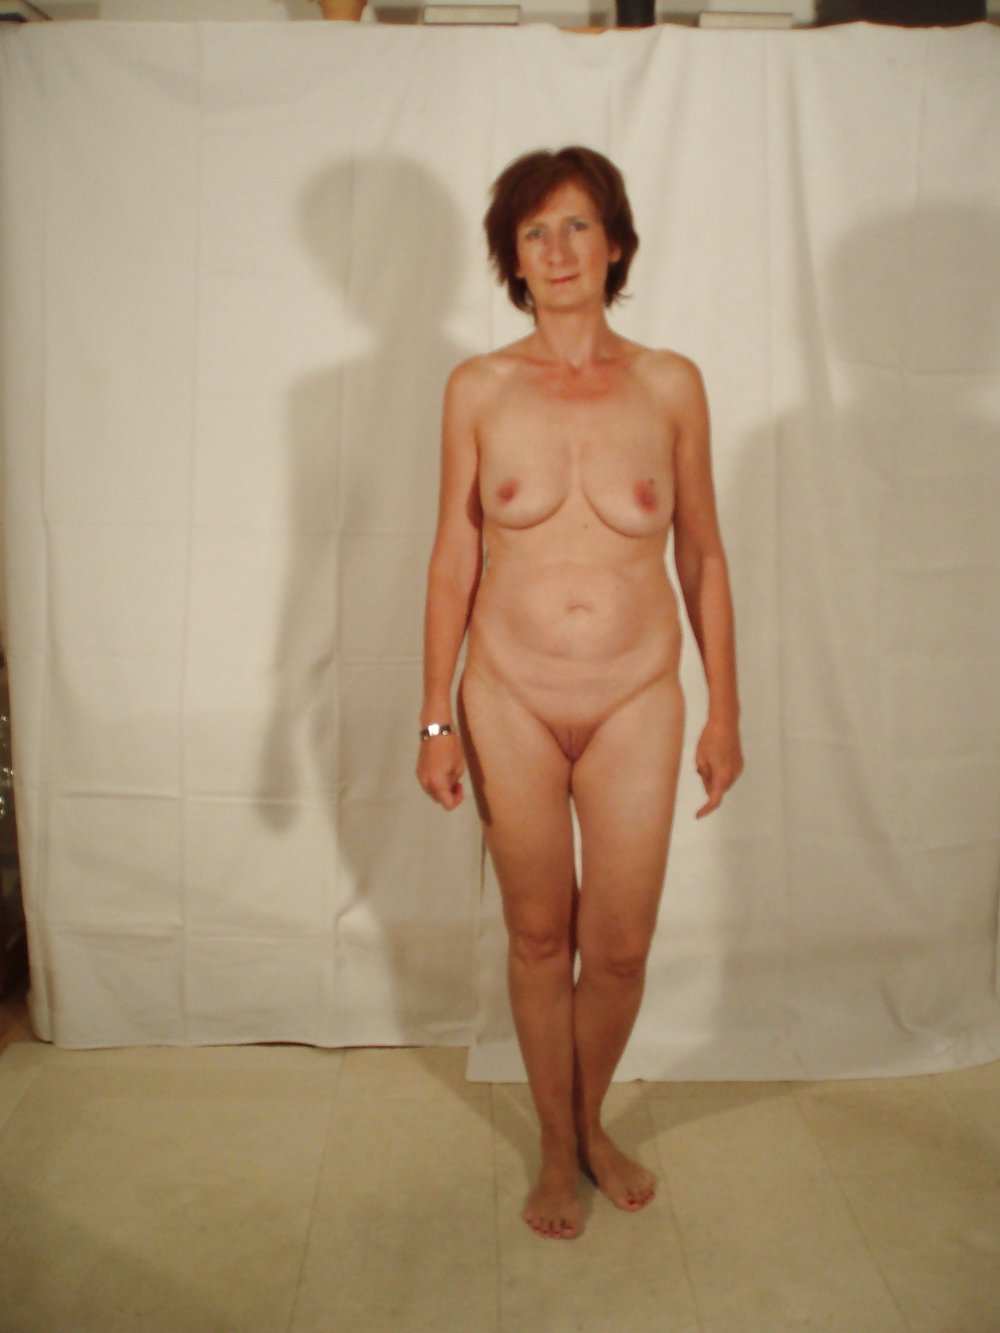 Ehefrau nackt tumblr Amateure: 2,054,905